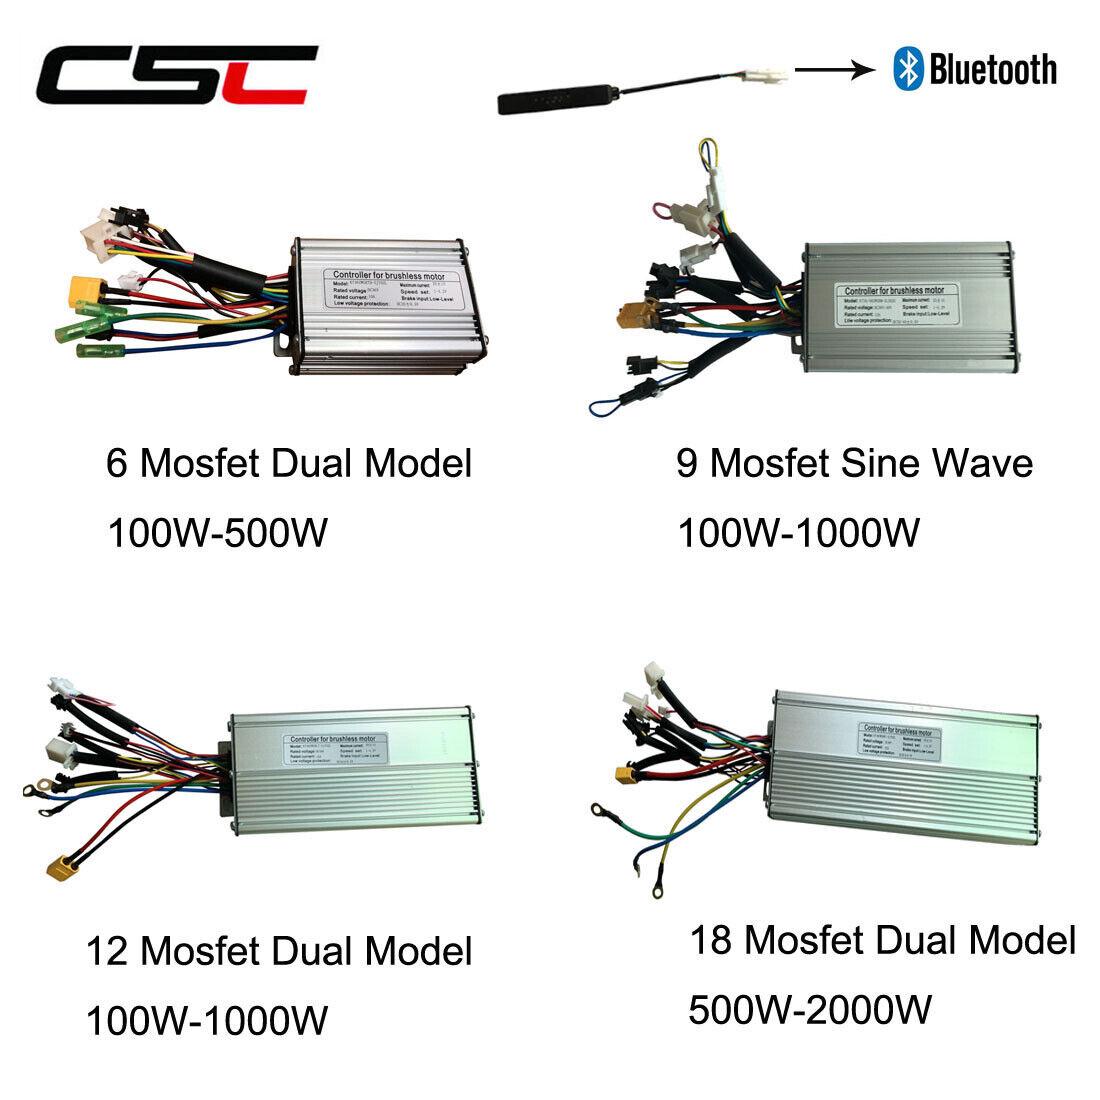 REGOLATORE Brushless BICI E KT 6 9 12 18 MOSFET 36V 48V 250W 1000W 1500W 2000W